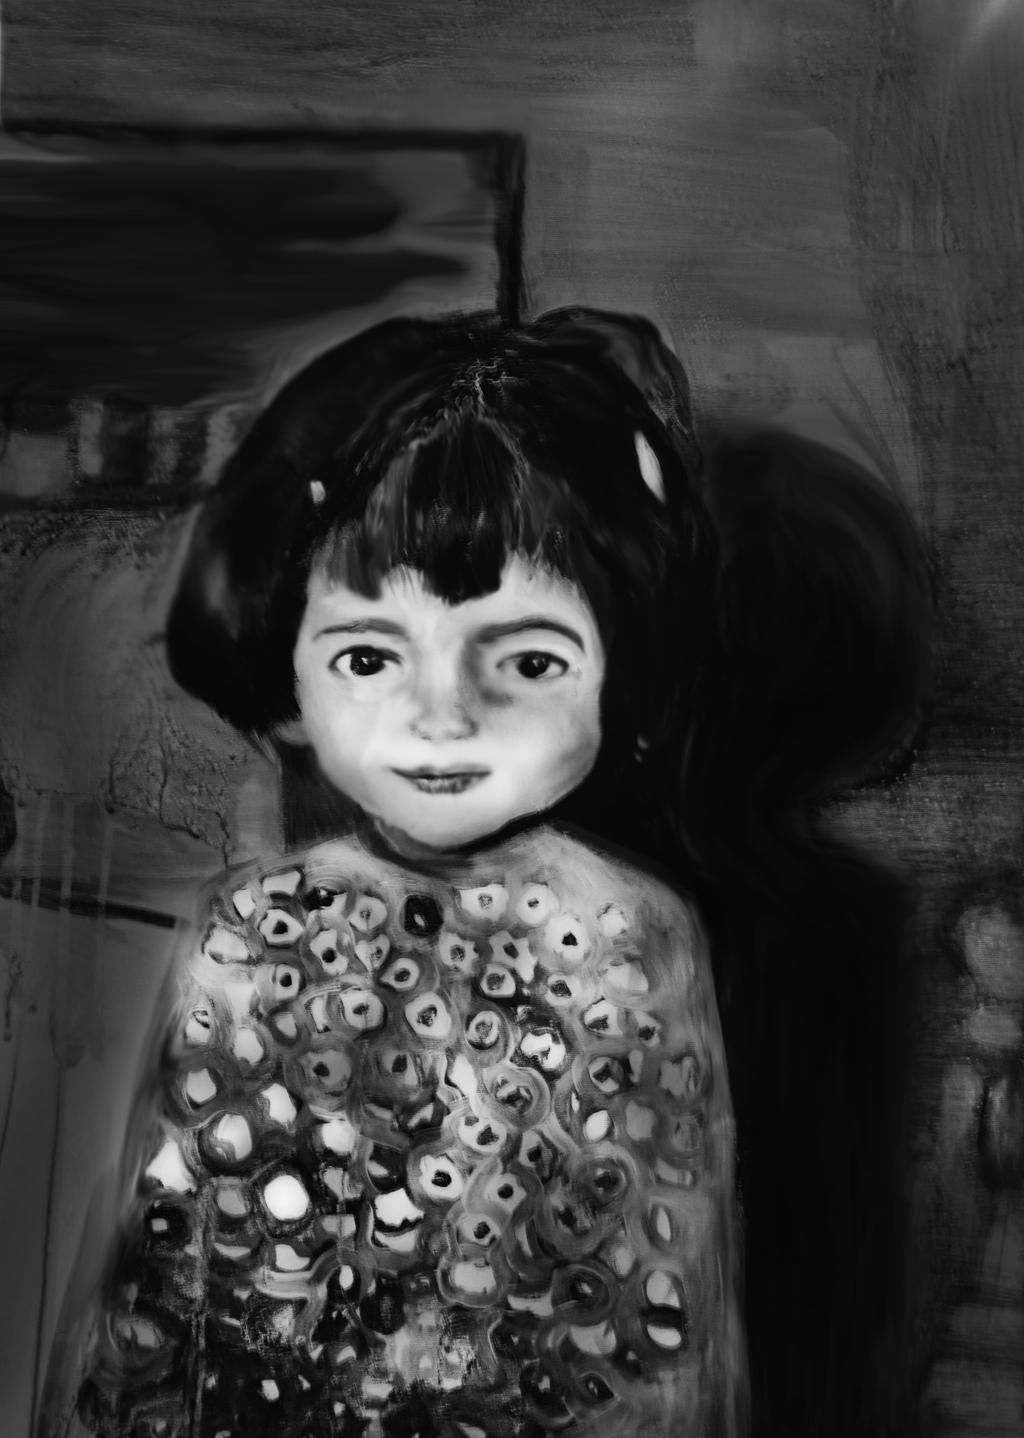 Childhood by StrangerLyri